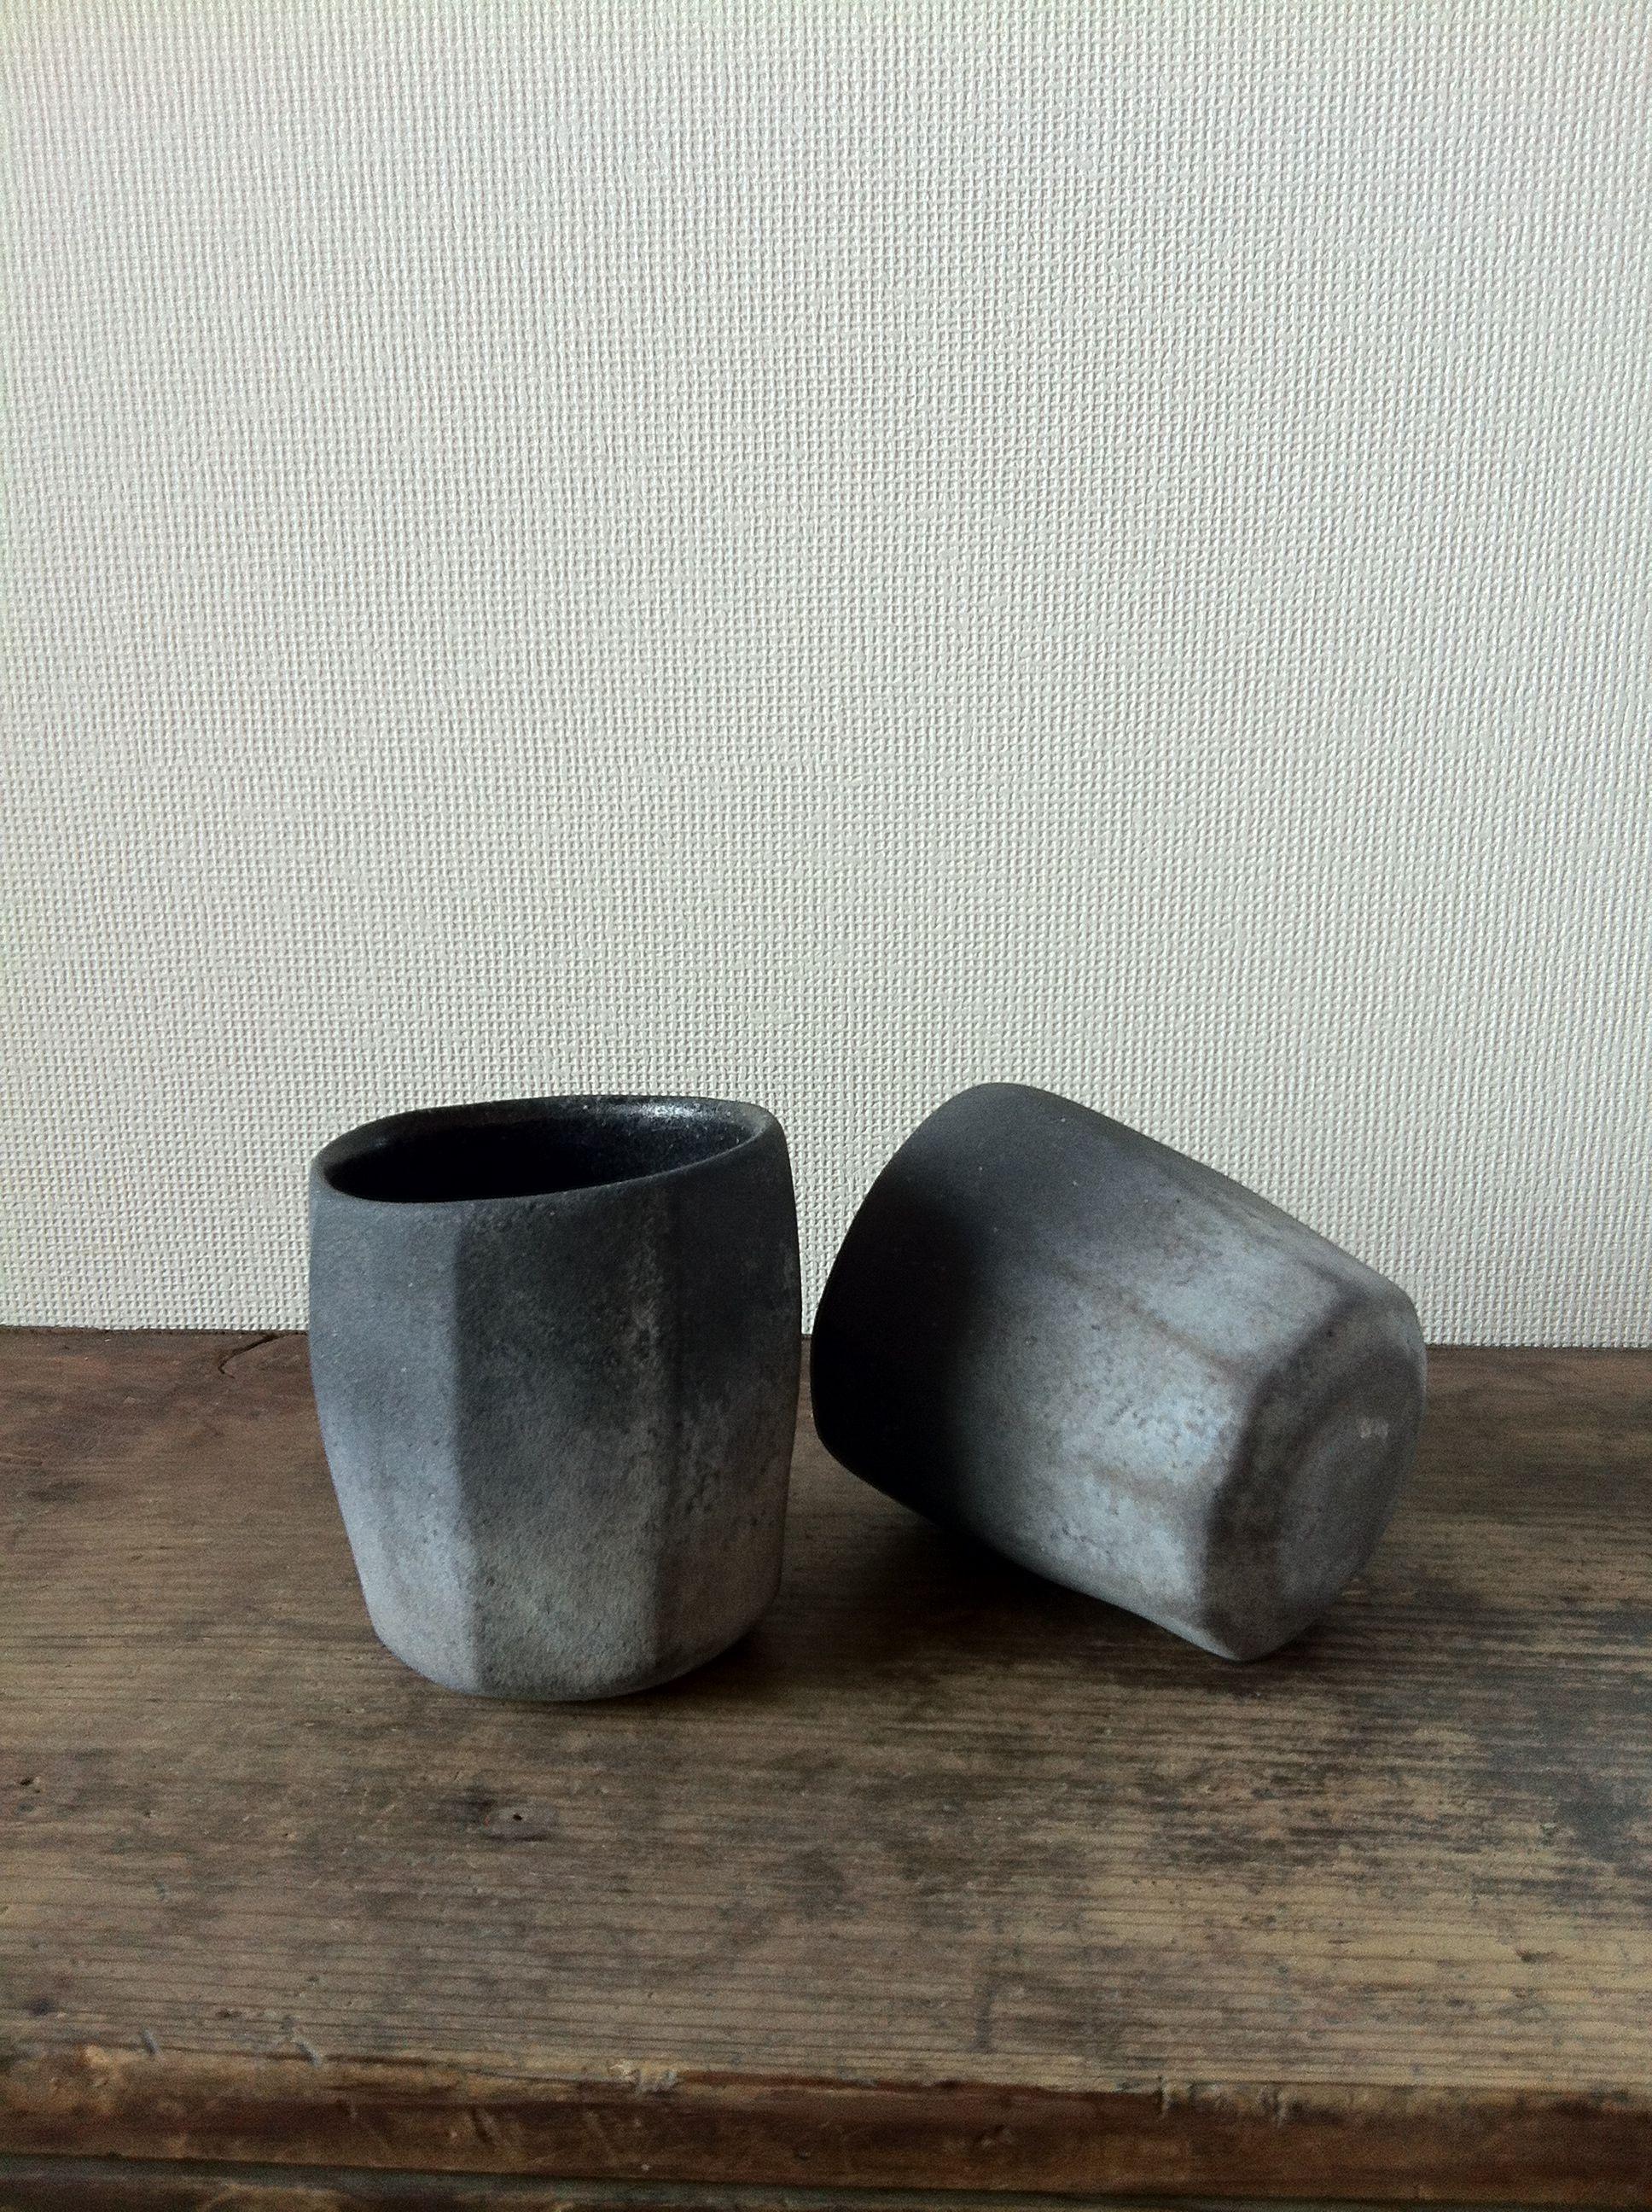 Gomi Kenji.  五味憲二さんのカップです。